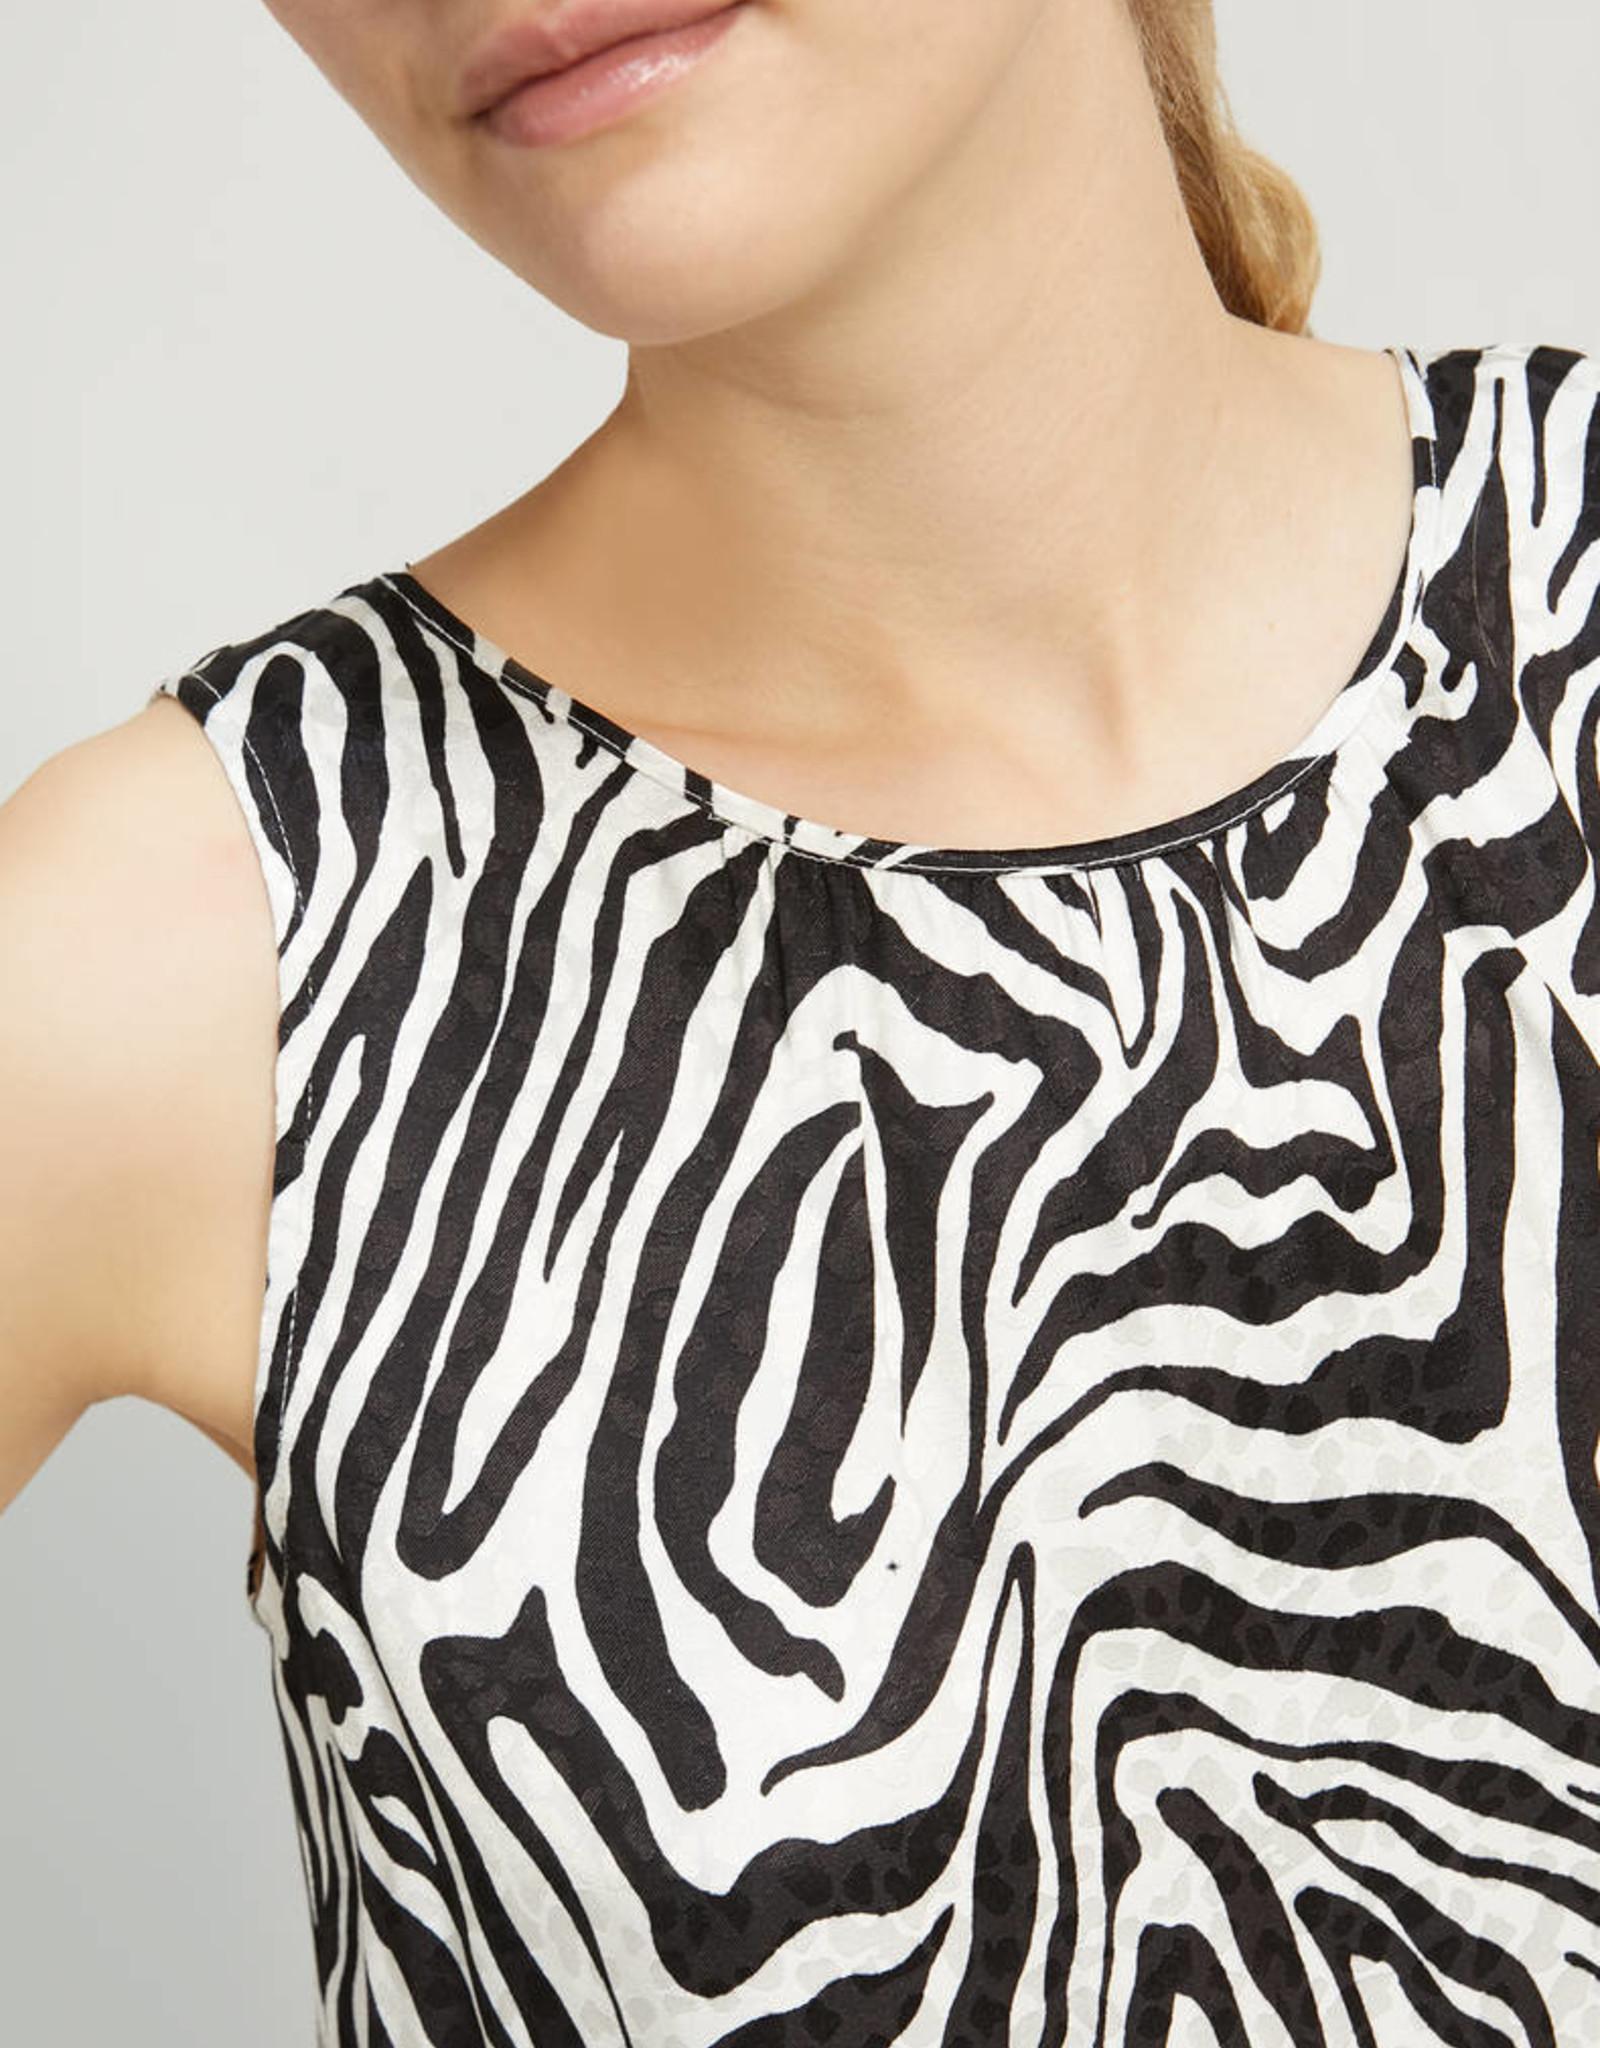 PENNYBLACK Top Zebra Print Black en White